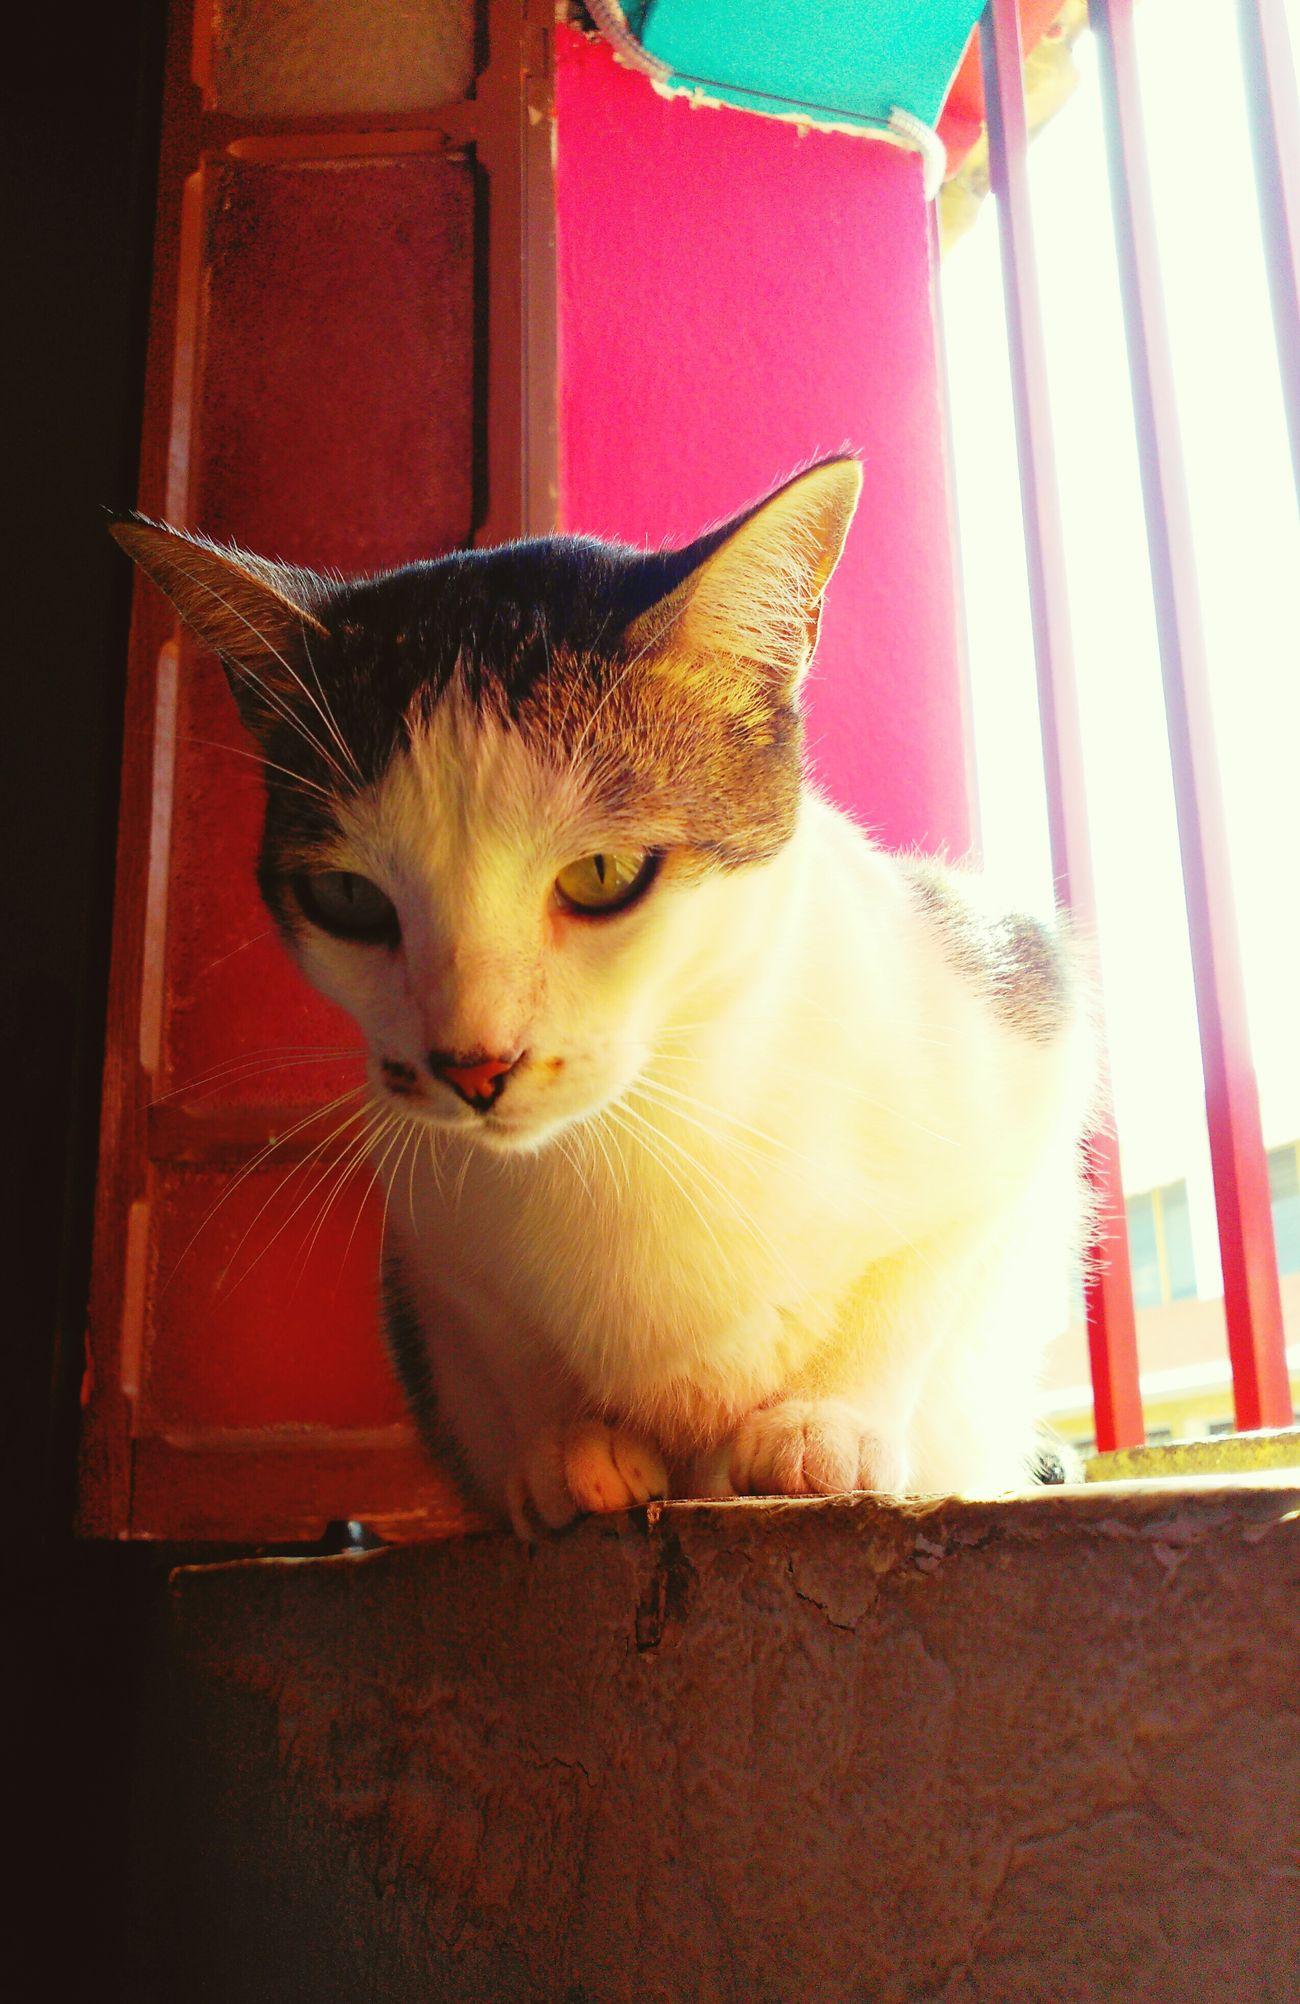 Matilda Domestic Cat Cats 🐱 Caturday ! Cats Of EyeEm Catsoftheworld Catslover Catslife Gato😽 Gatto😸 Gatita  Gata ♡ Gats :))